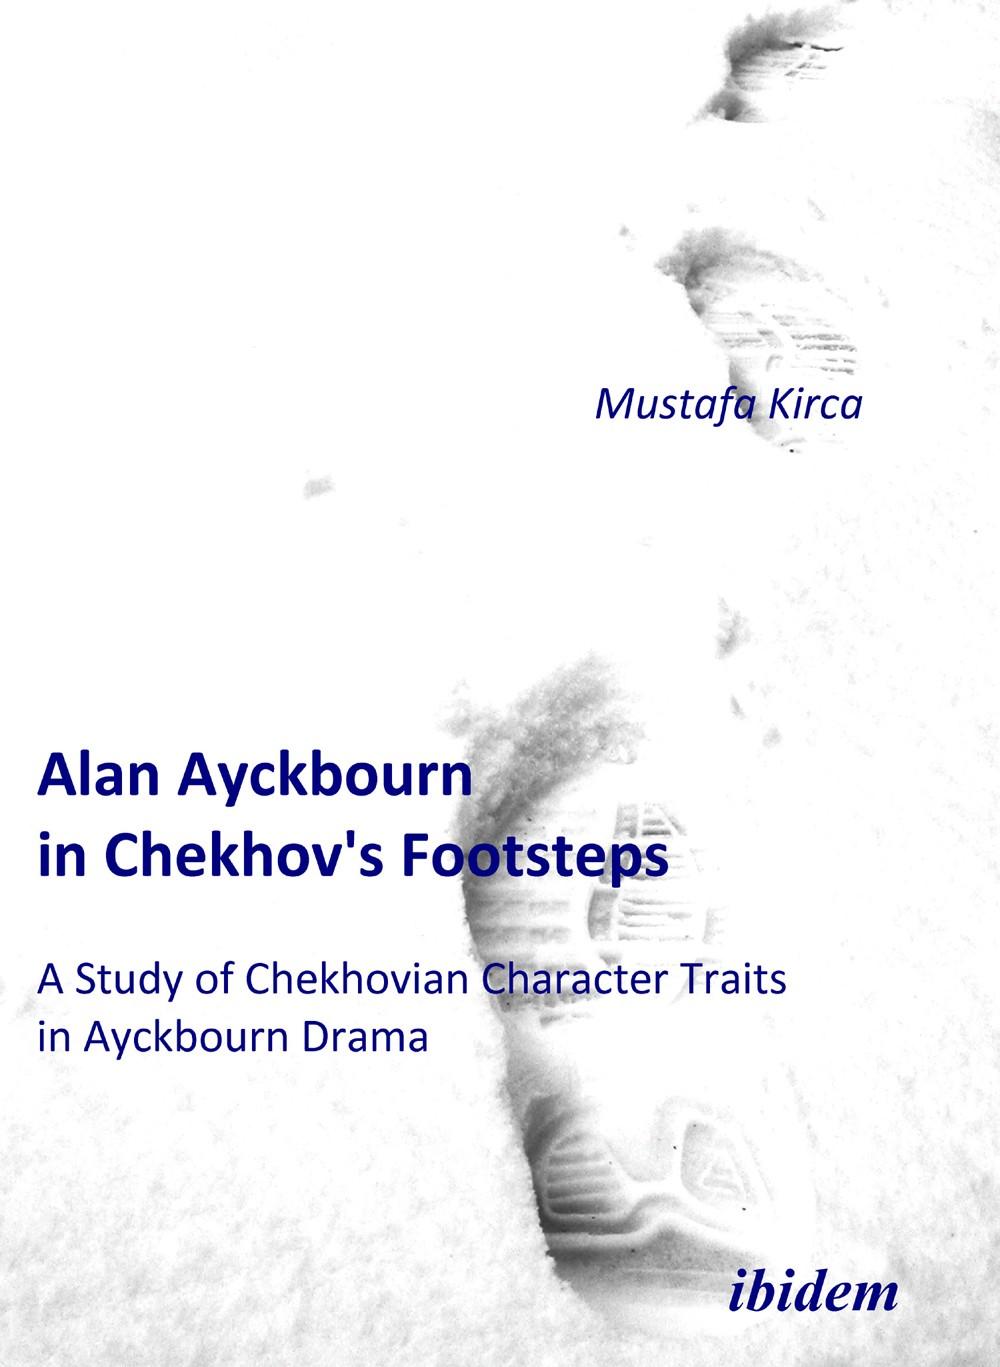 Alan Ayckbourn in Chekhov's Footsteps. A Study of Chekhovian Character Traits  in Ayckbourn Drama